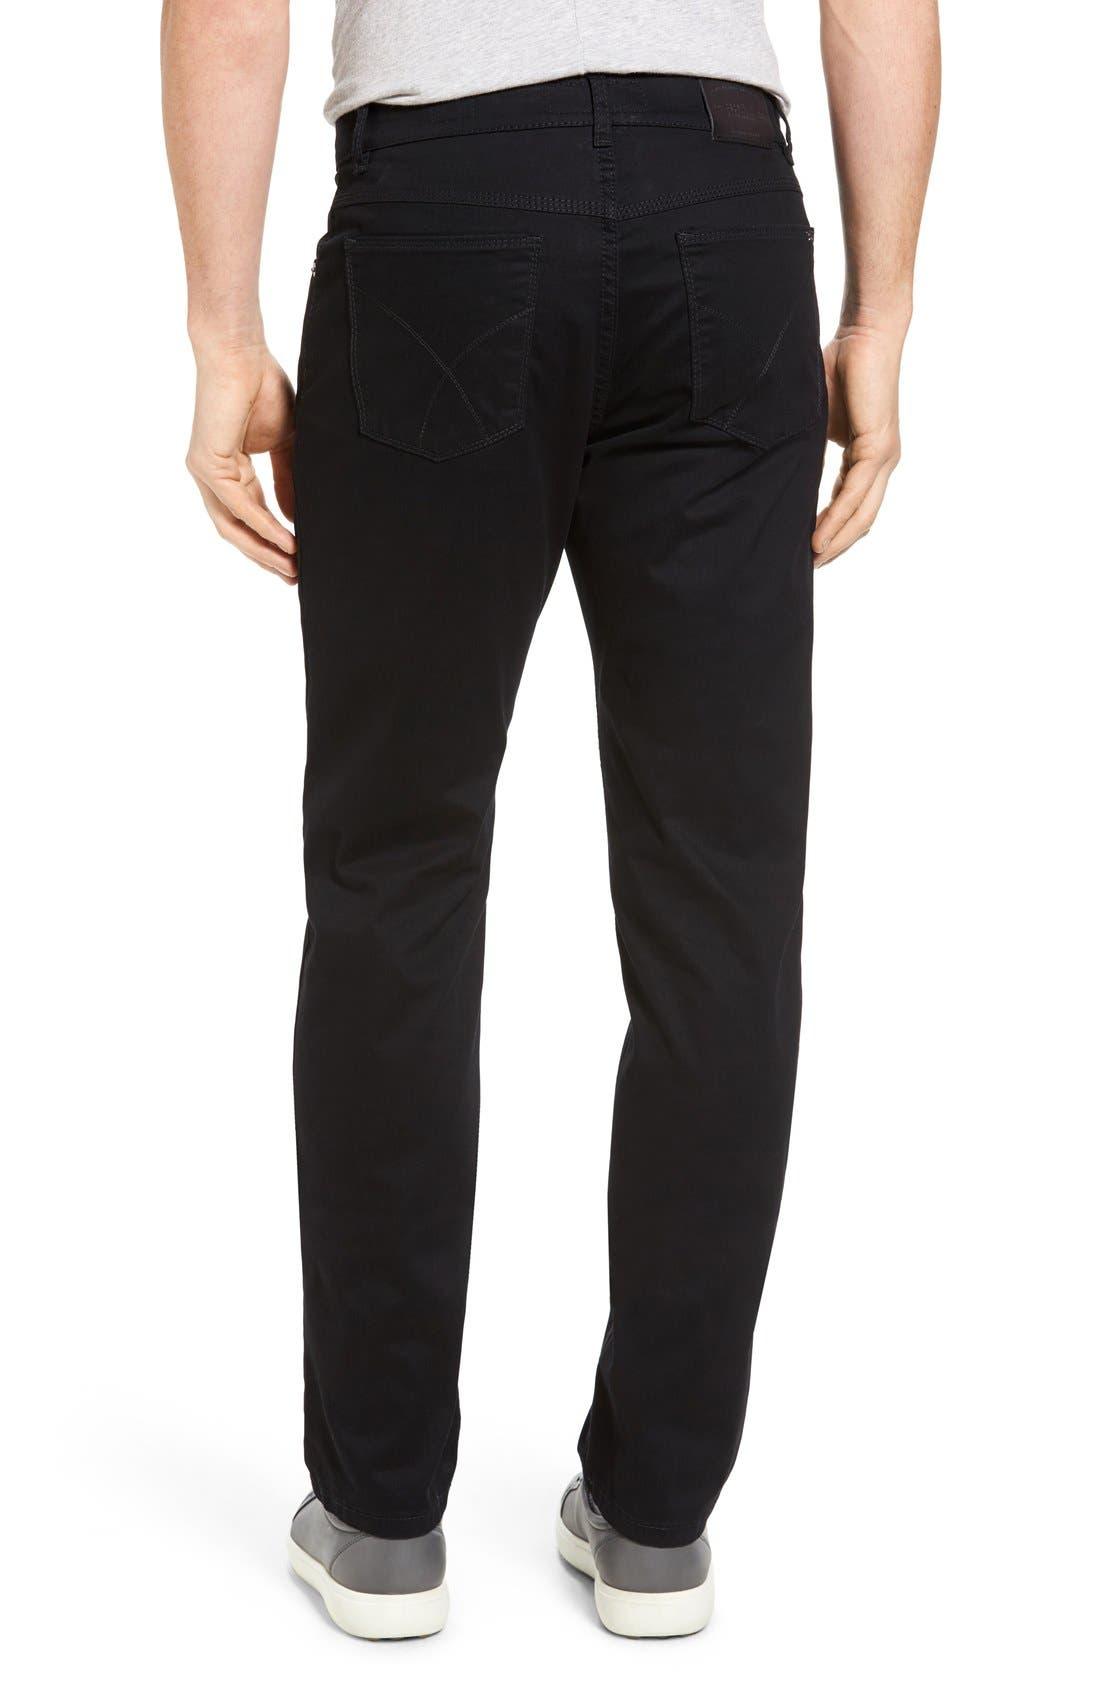 Cooper Prestige Stretch Cotton Pants,                             Alternate thumbnail 8, color,                             PERMA BLACK